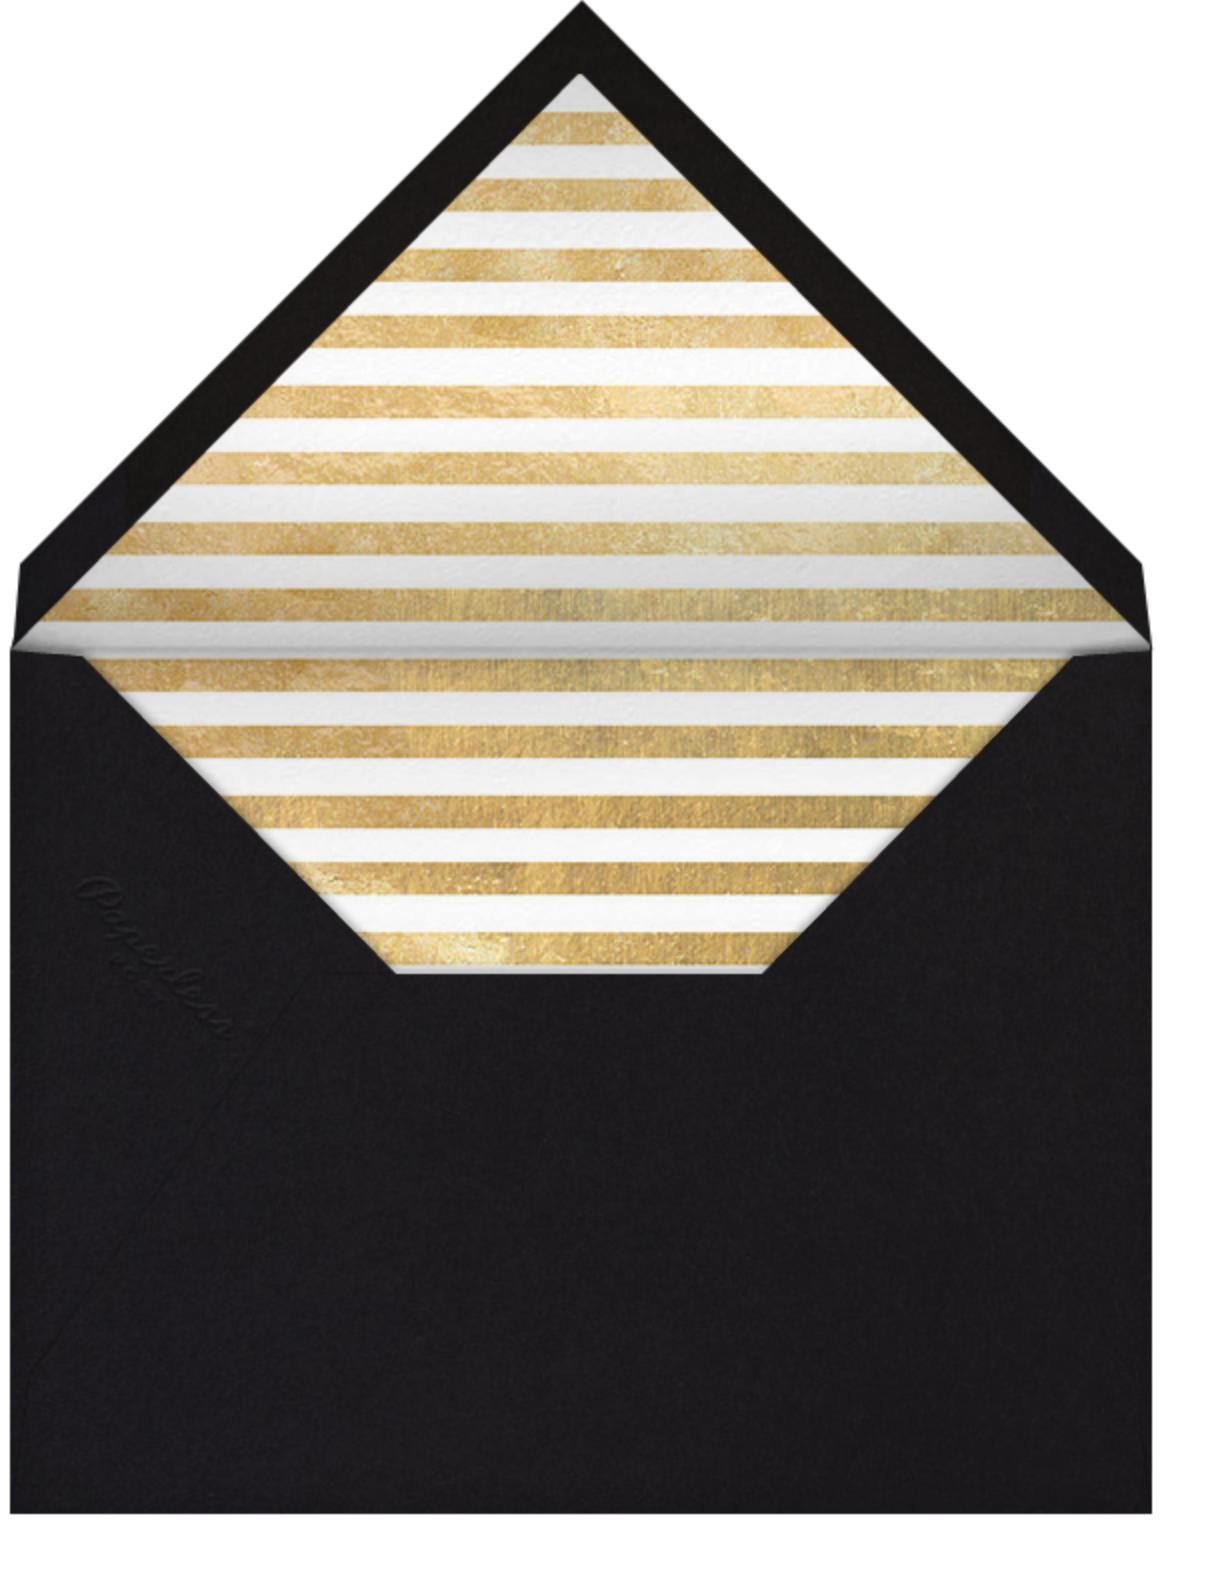 Deco Diamond - Paperless Post - New Year's Eve - envelope back